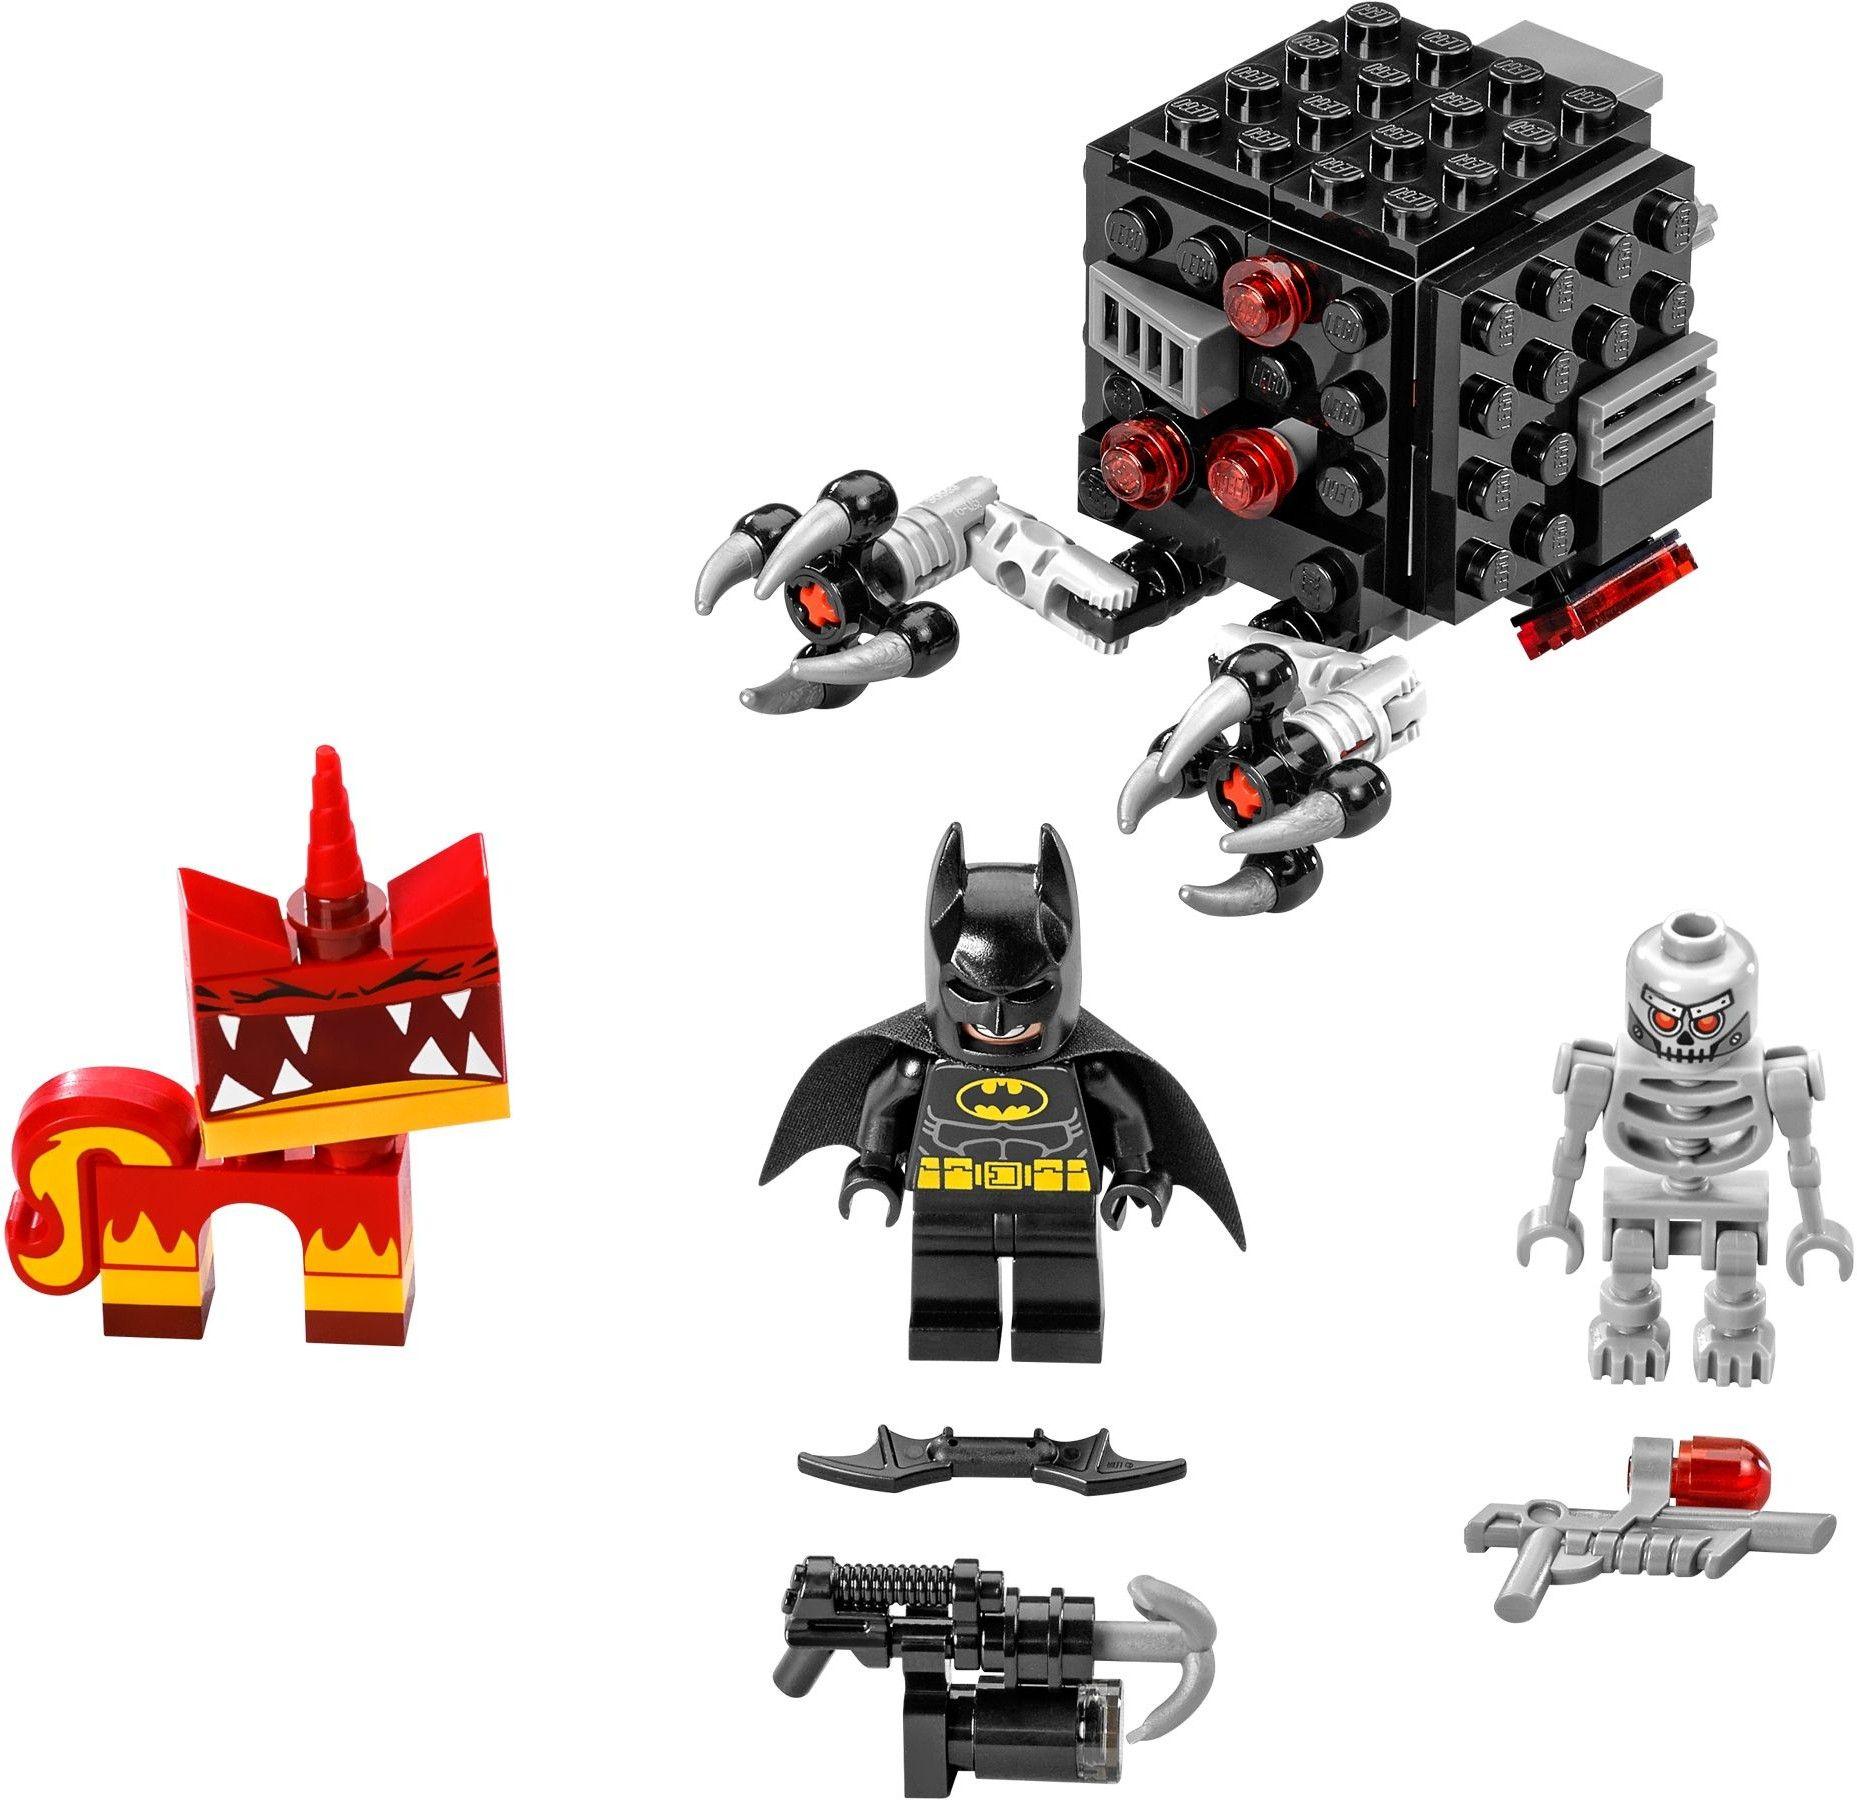 70817 1 Batman Super Angry Kitty Attack Lego Movie Lego News Batman